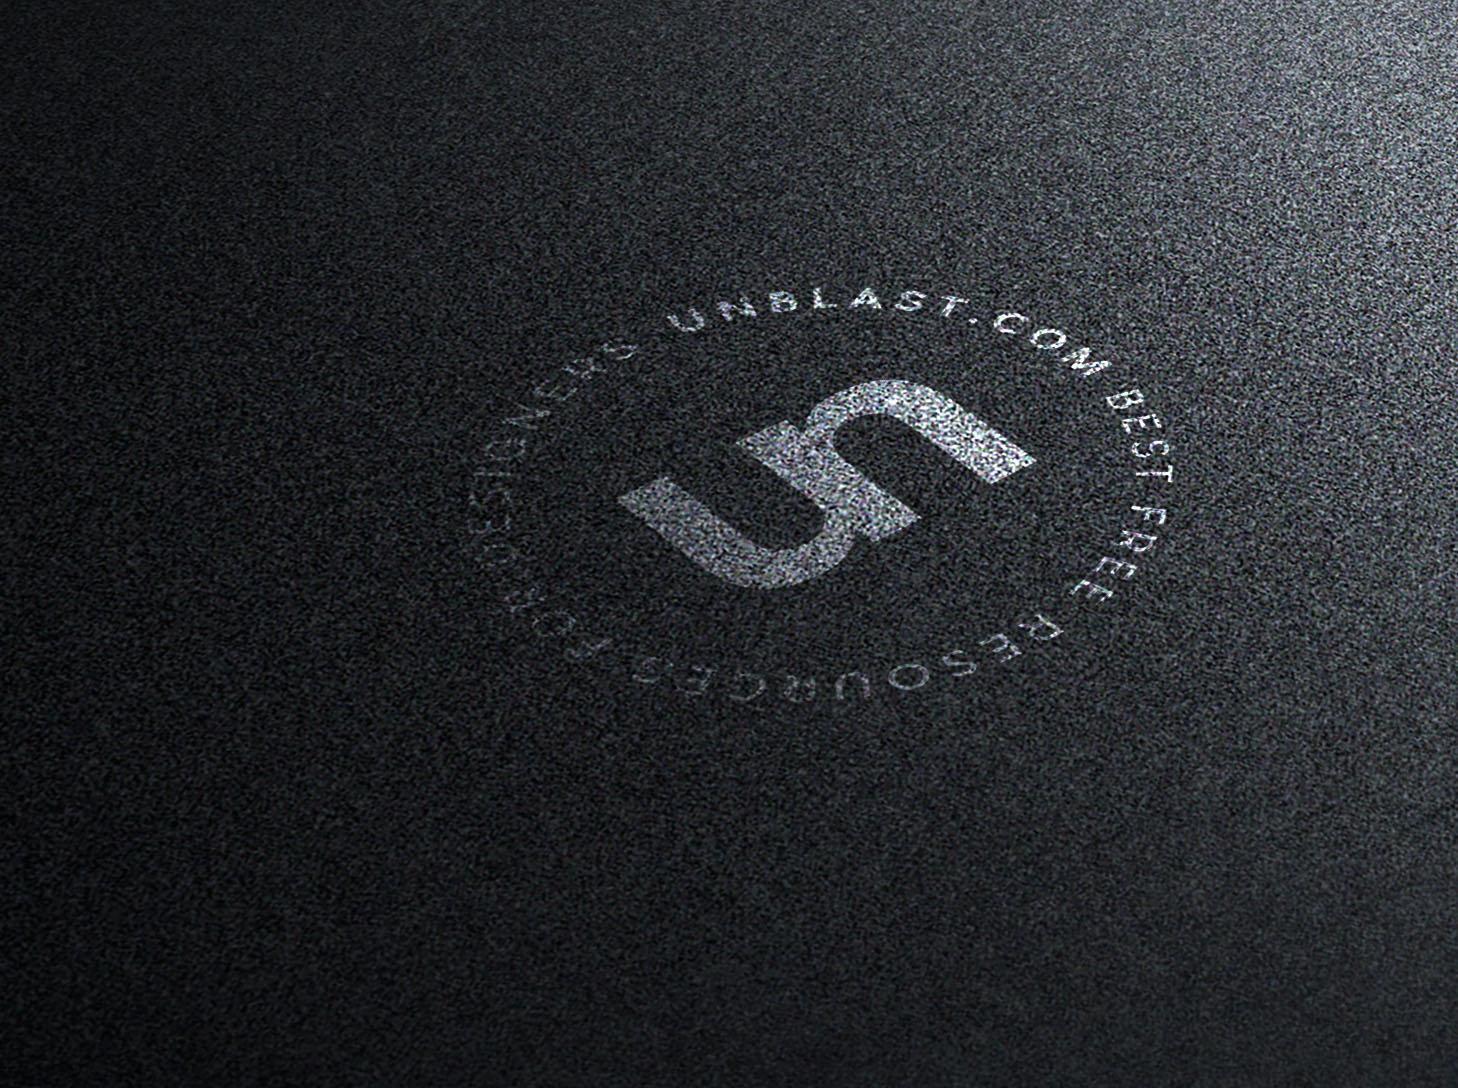 Silver on Black Logo Mockup